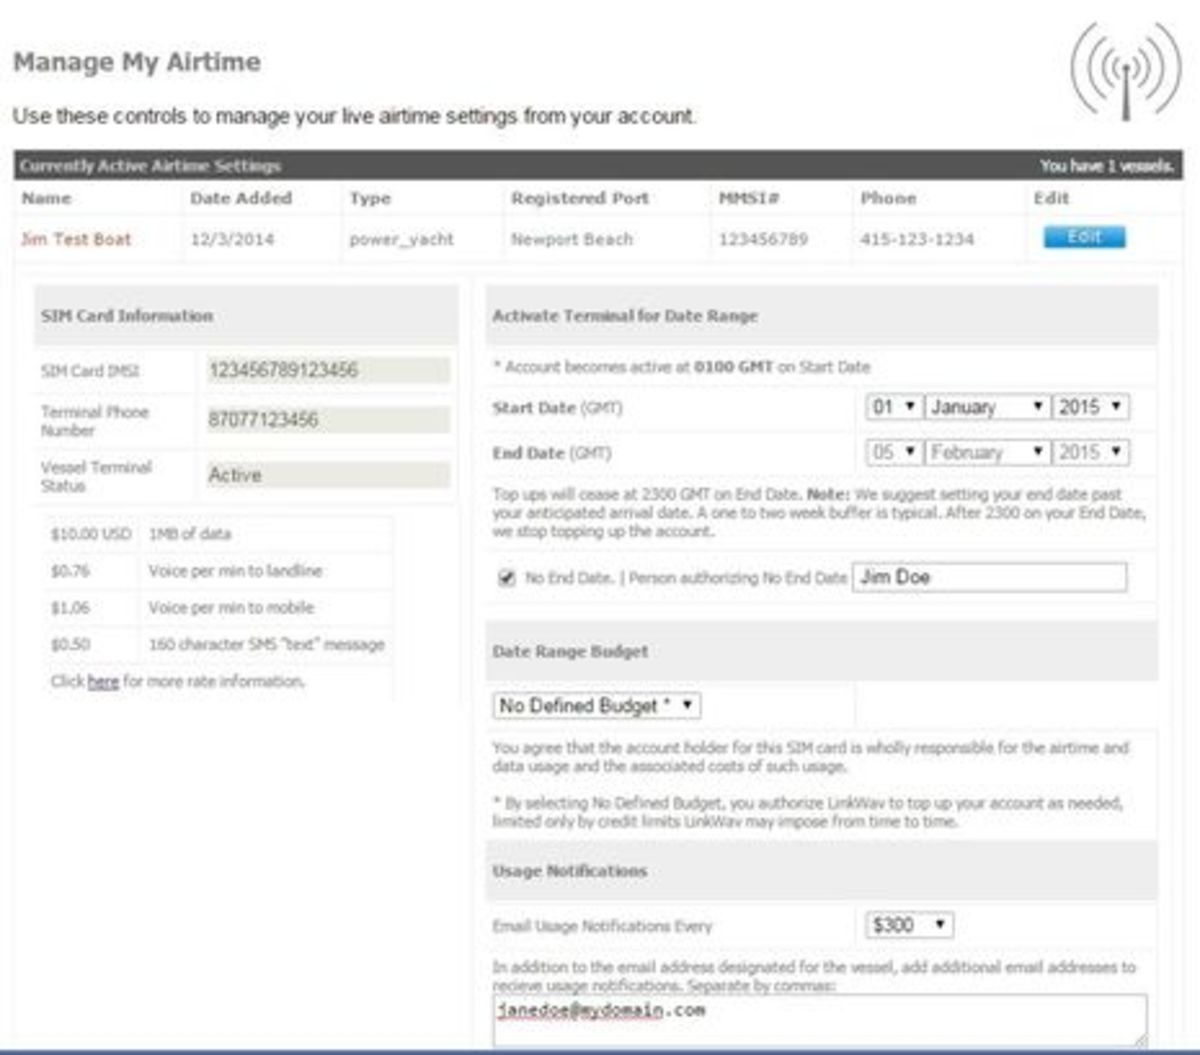 LinkWav_Manage_My_Airtime_web_page_aPanbo.jpg